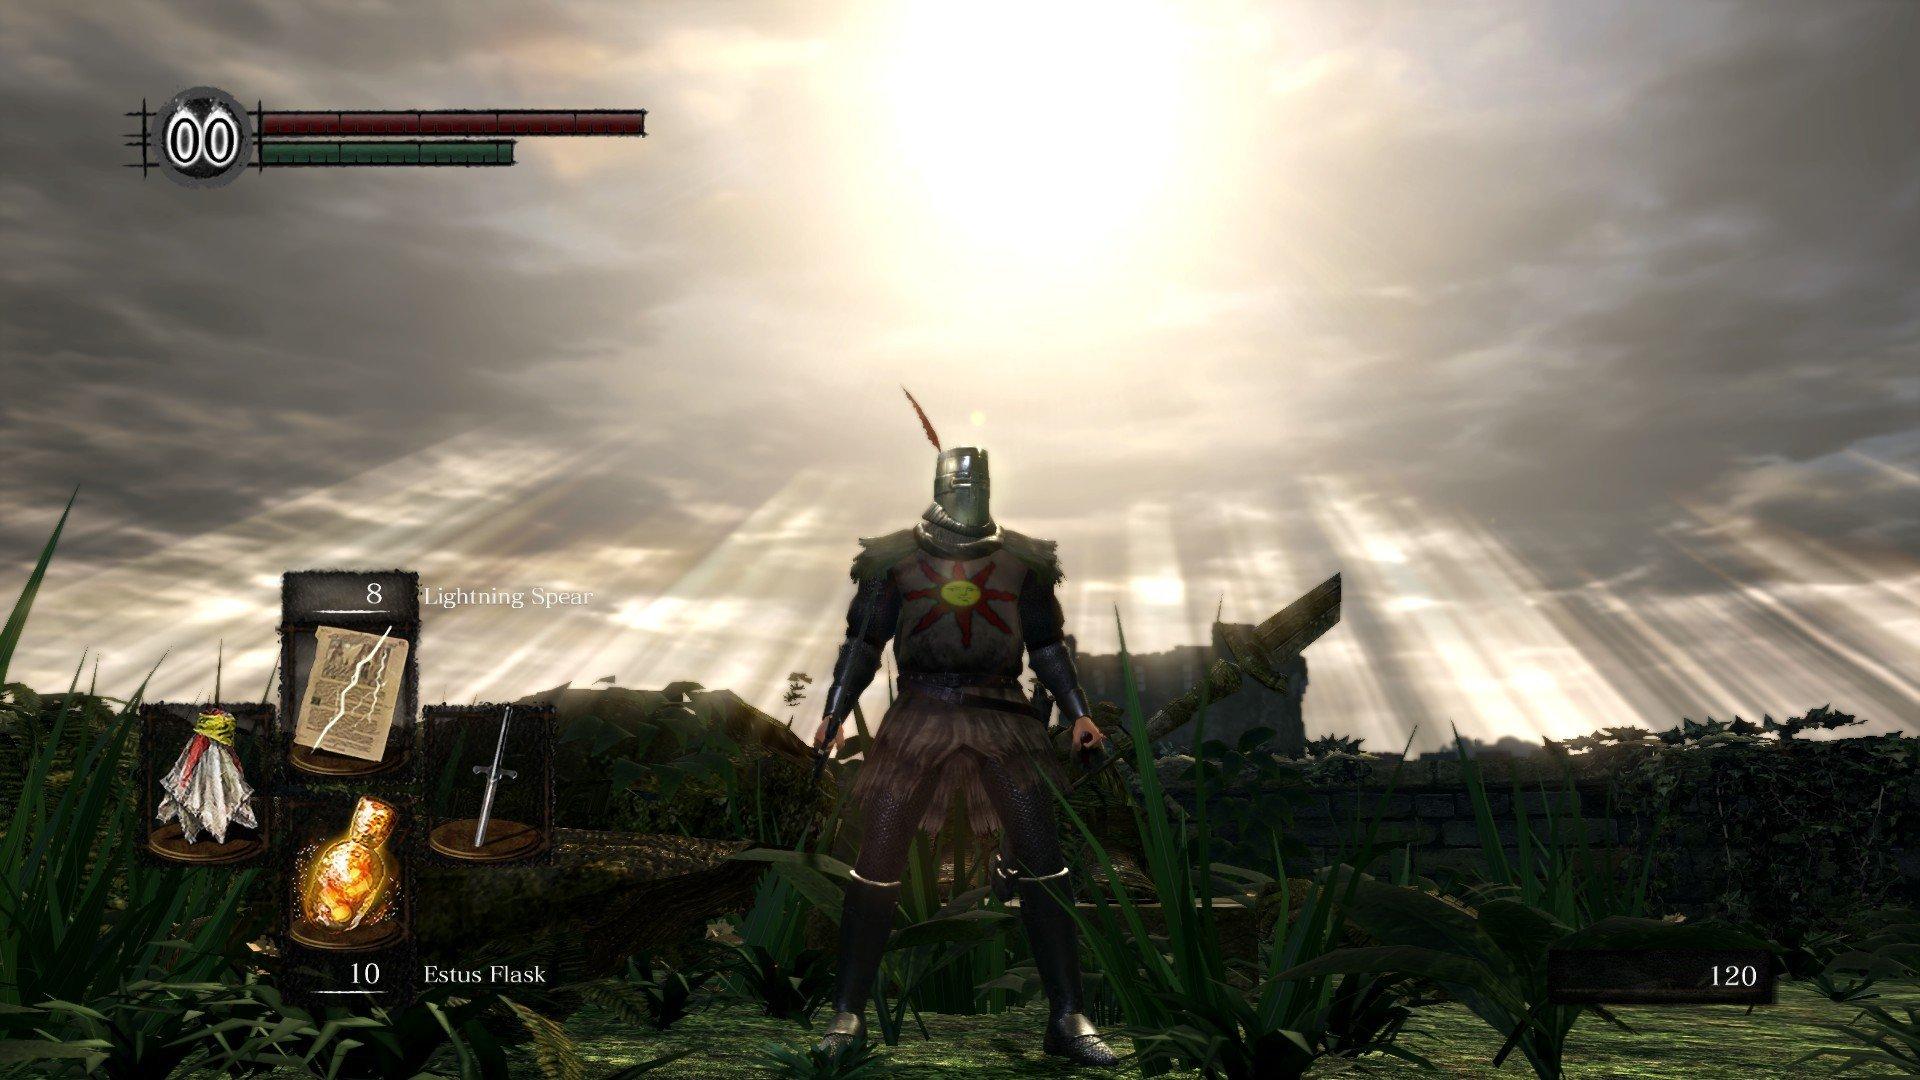 Warrior of Sunlight dark souls remastered network test